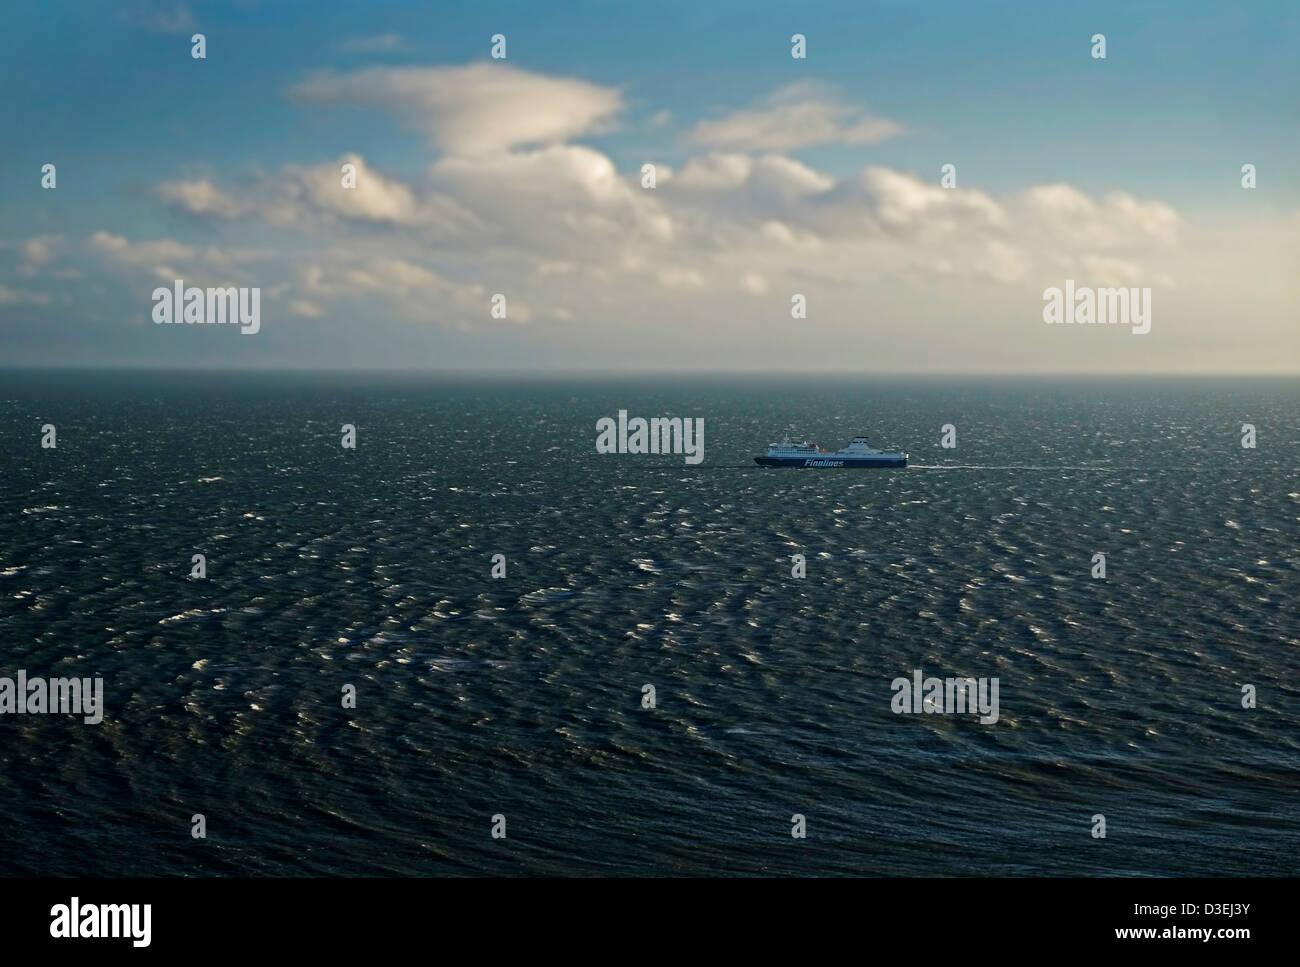 Finnlines Ferry Ship in Dublin Bay. - Stock Image